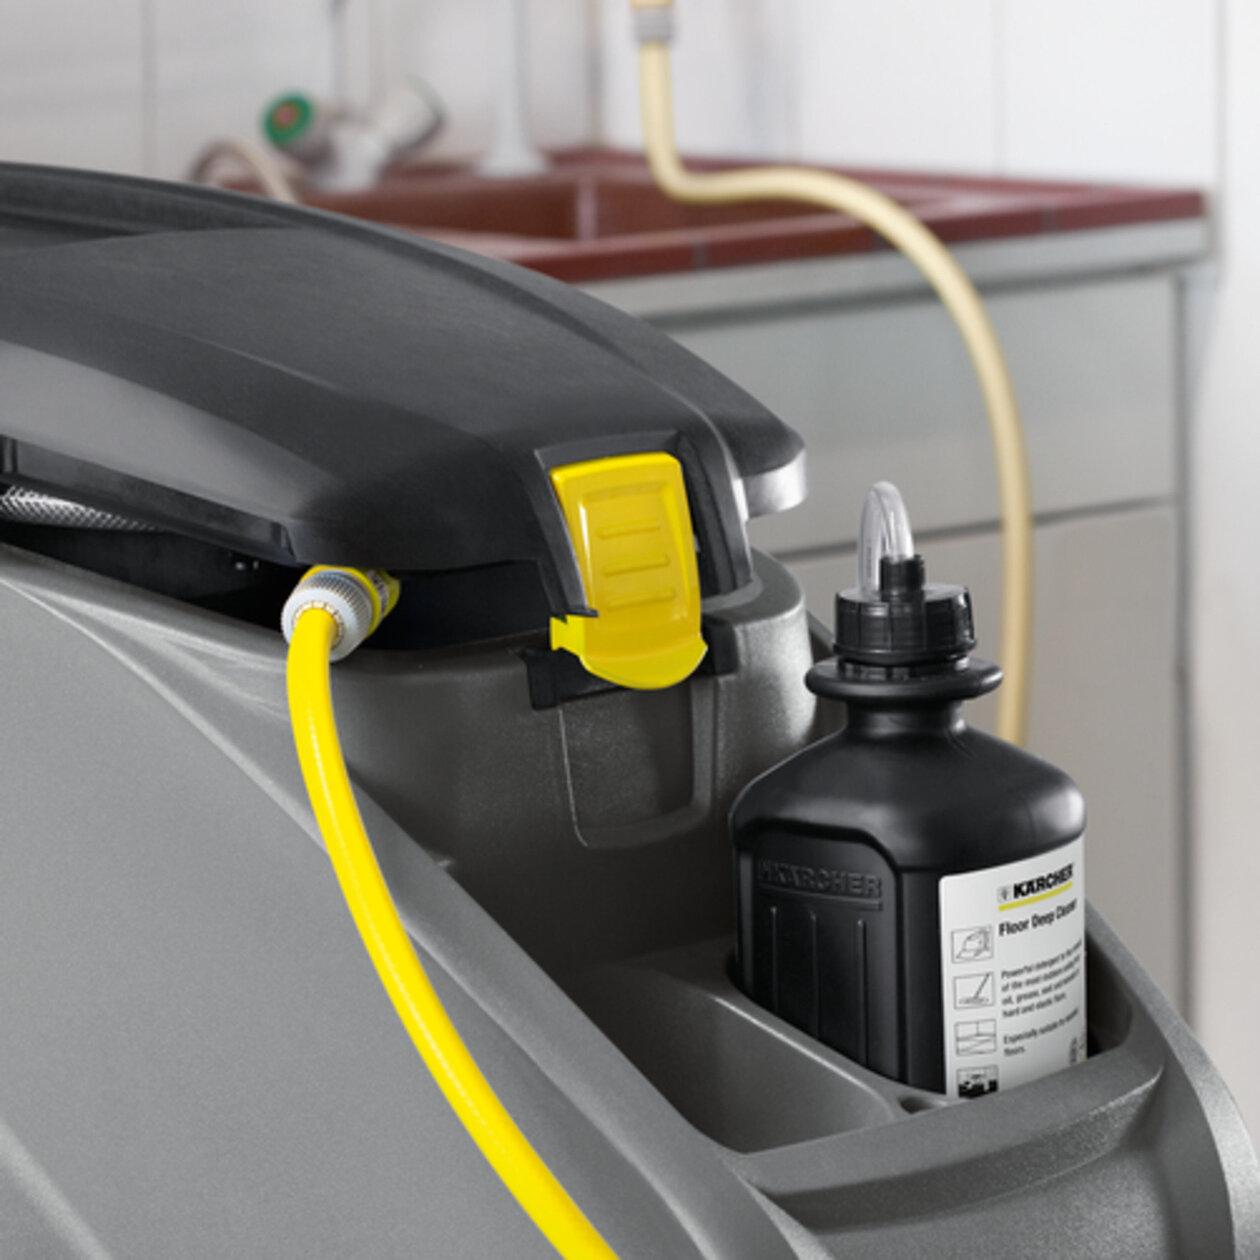 Schrob-/zuigmachine B 40 DOSE Fleet+105Ah+R55+Rinsing+AutoFi: Reinigingsmiddelendosering DOSE